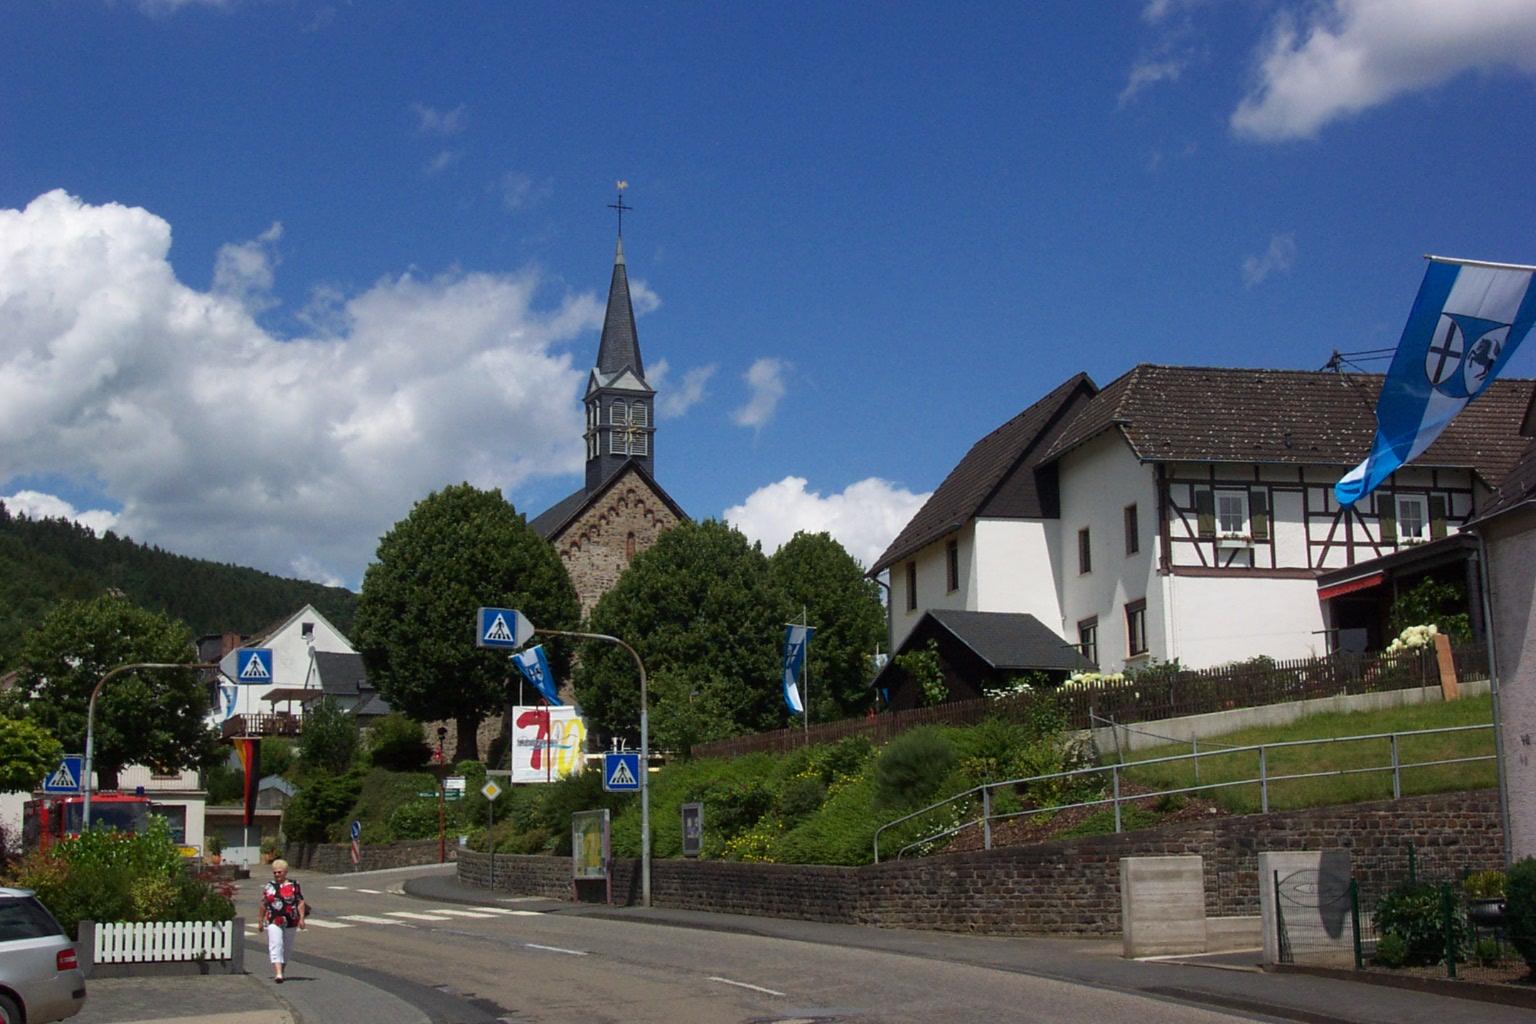 Bild St. Michael Kirche Roßbach/Wied